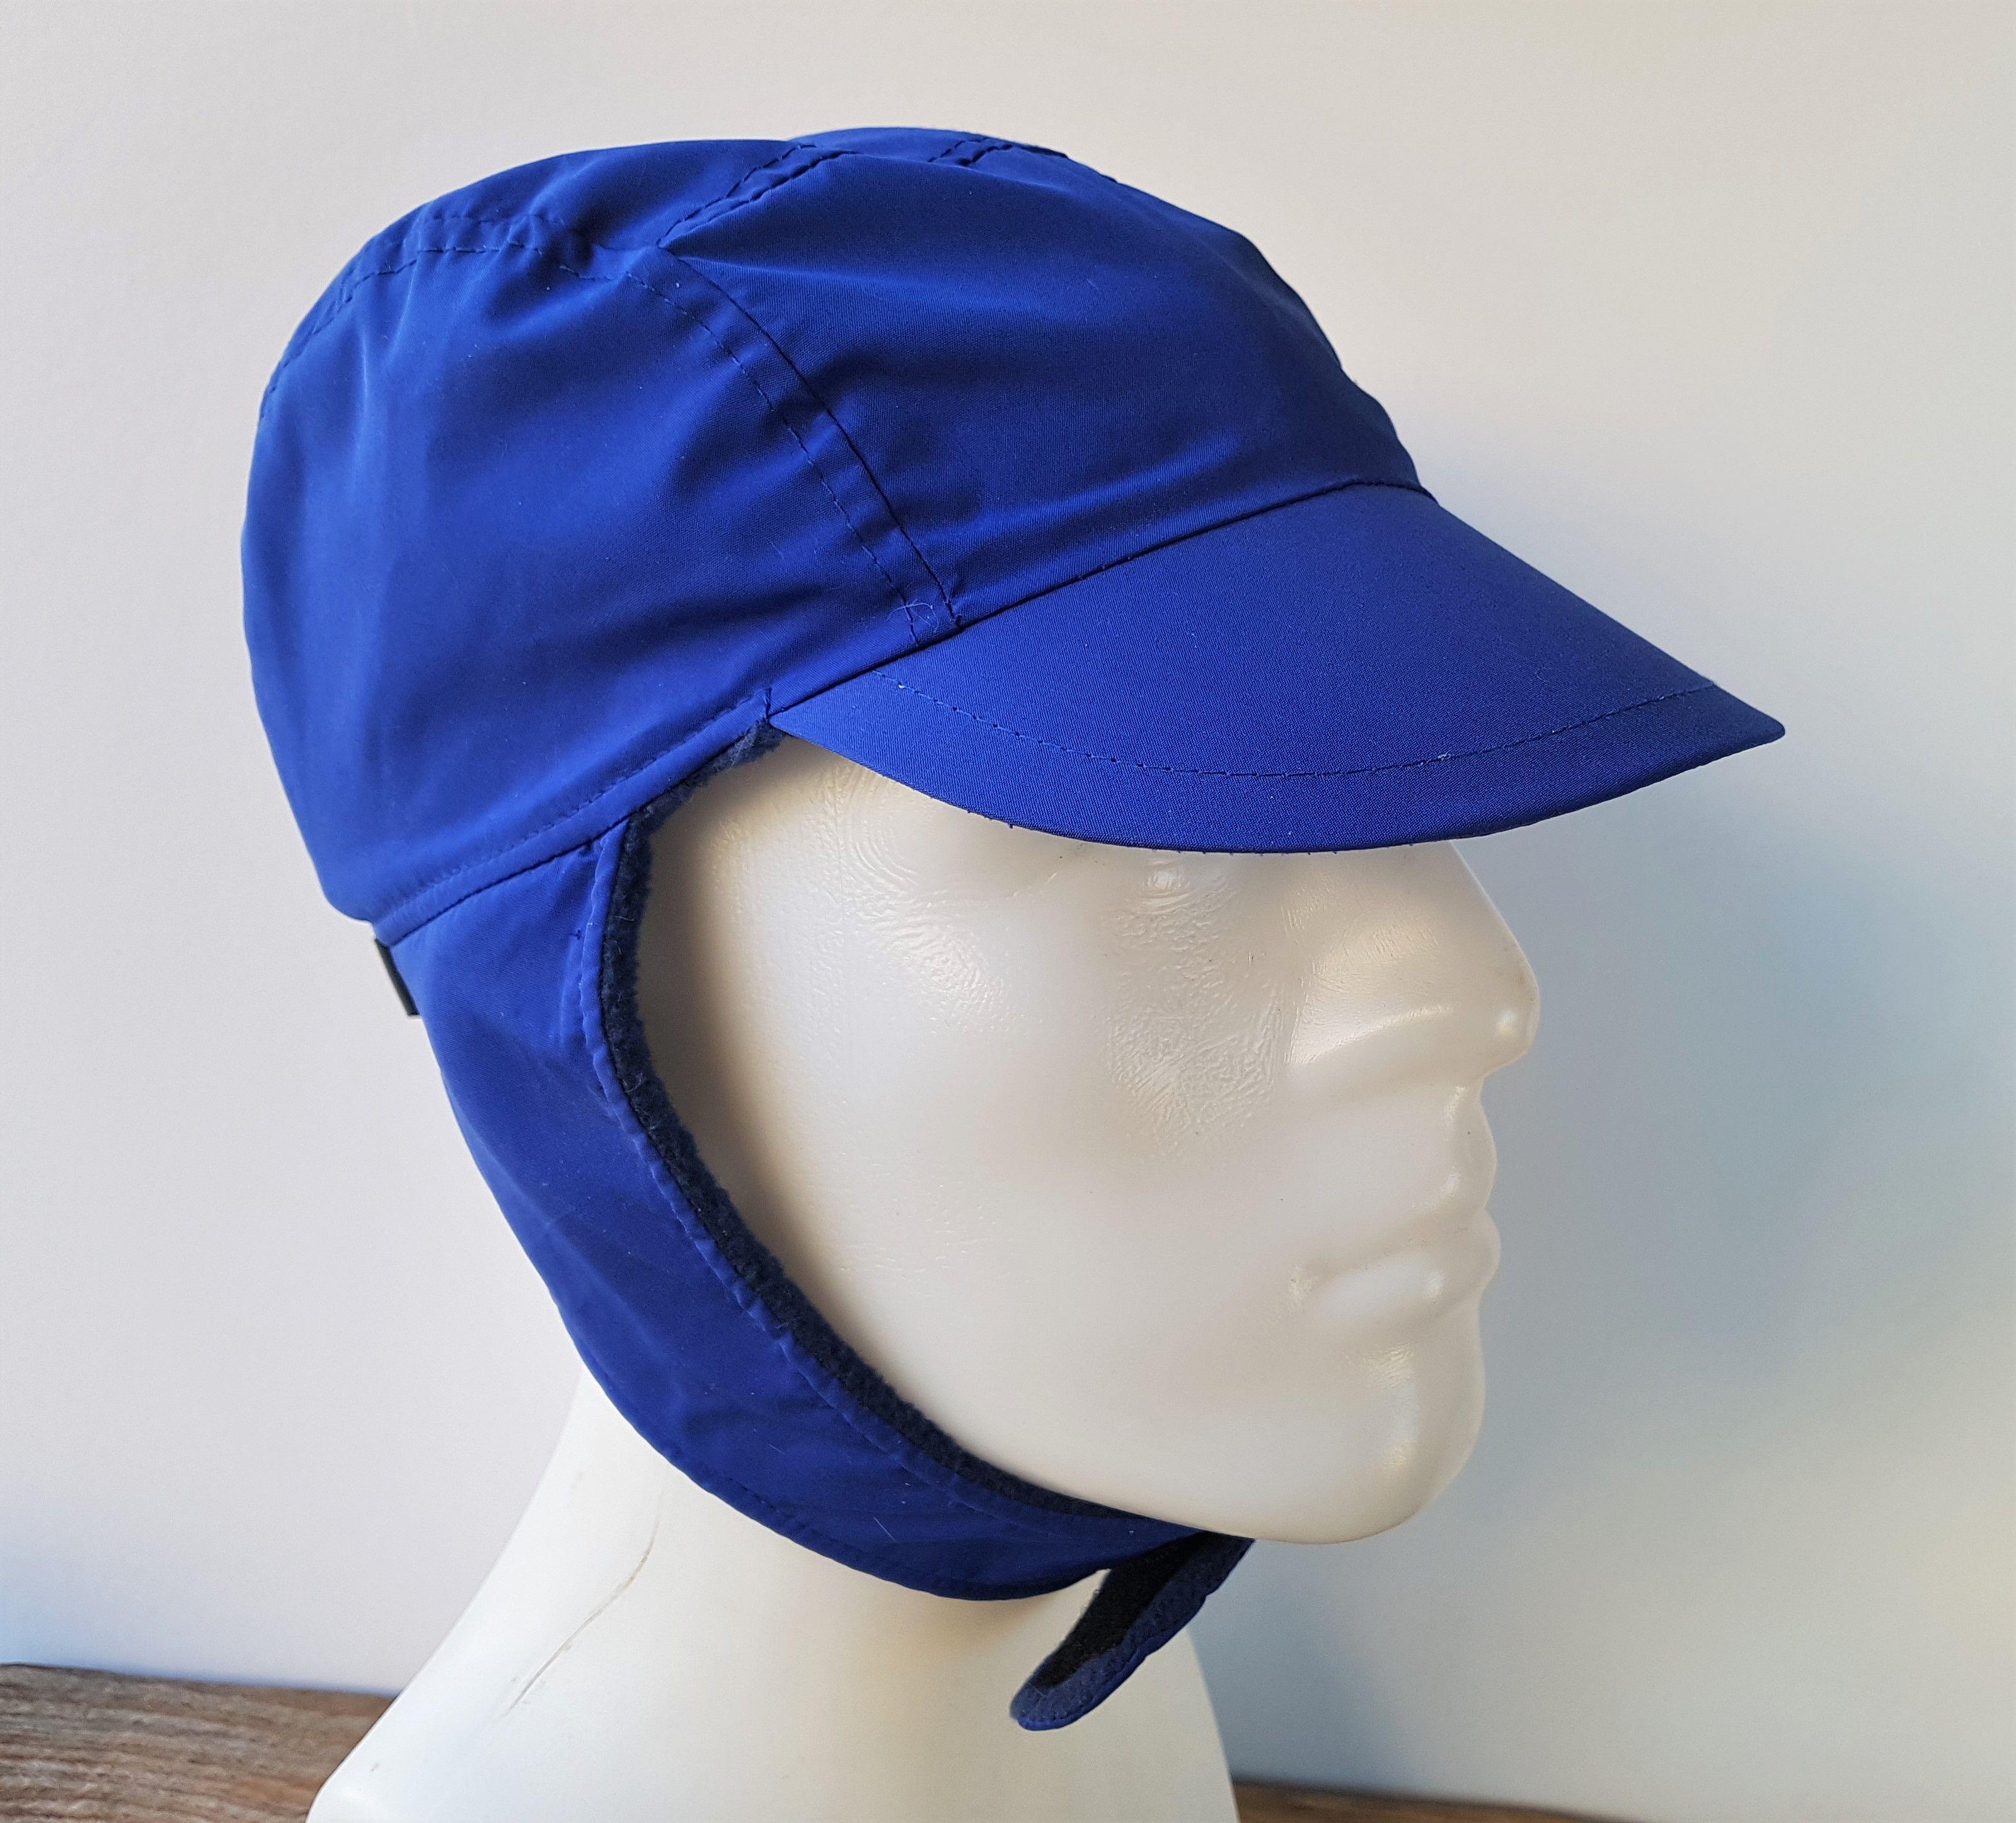 Vintage Mountain Equipment Co Op 5 Panel Hiking Hat With Ear Etsy Hiking Hat Ear Hats Mountain Equipment Co Op